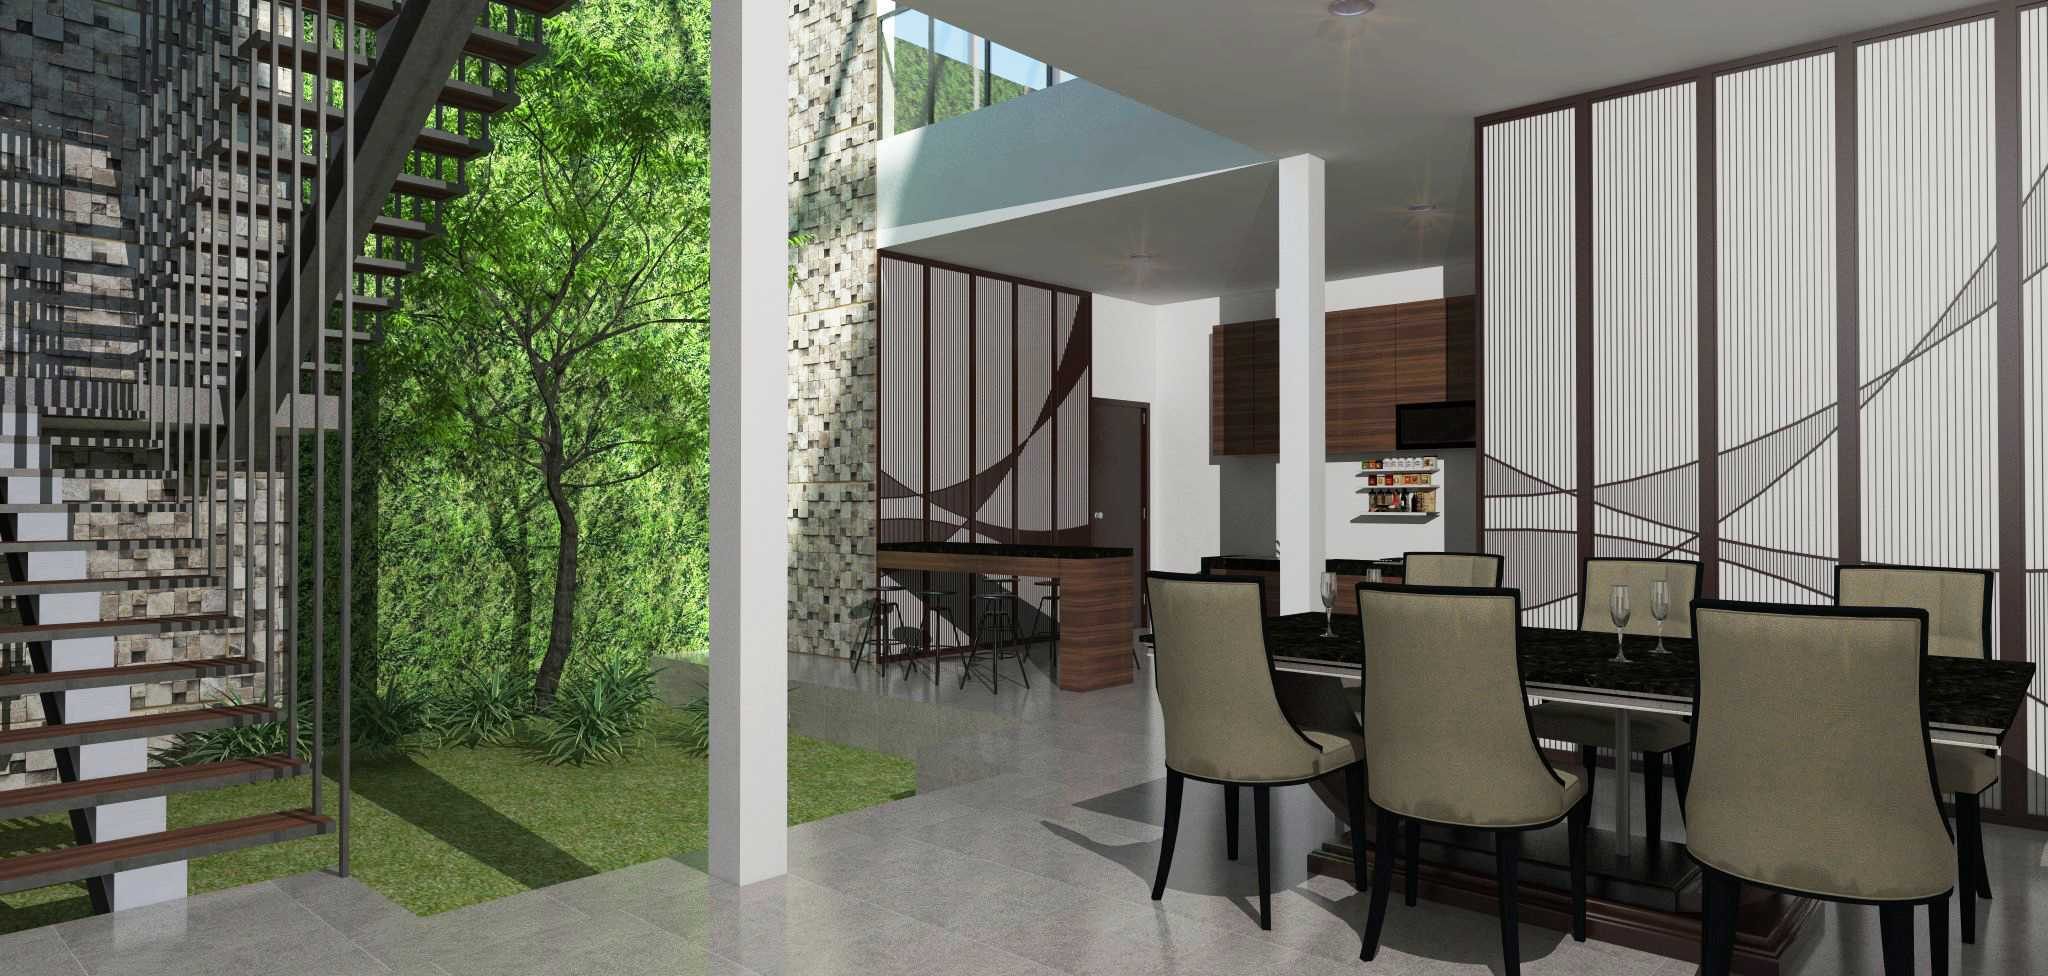 Ark-Chitect Studio Polygon House Bukit Lama, Kec. Ilir Bar. I, Kota Palembang, Sumatera Selatan 30149, Indonesia Bukit Lama, Kec. Ilir Bar. I, Kota Palembang, Sumatera Selatan 30149, Indonesia Ark-Chitect-Studio-Polygon-House   81416